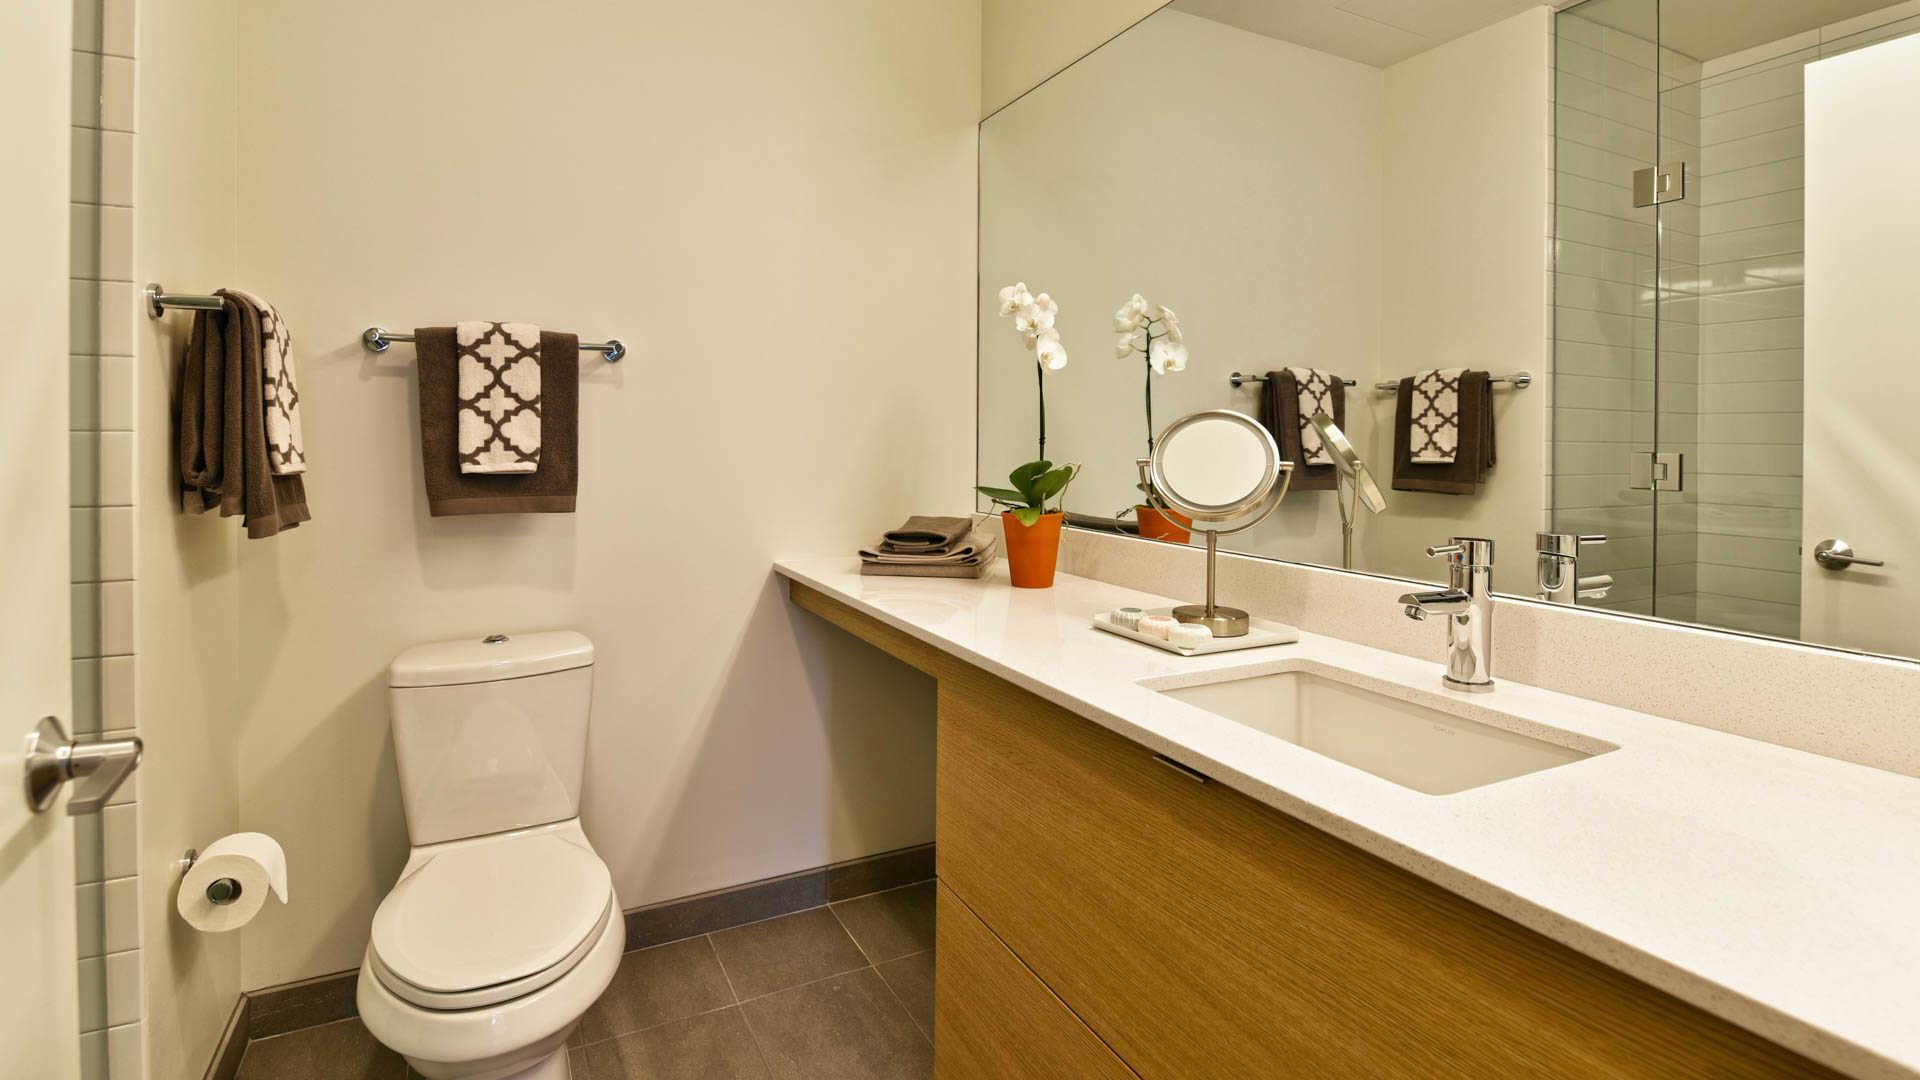 Girard apartments bathroom